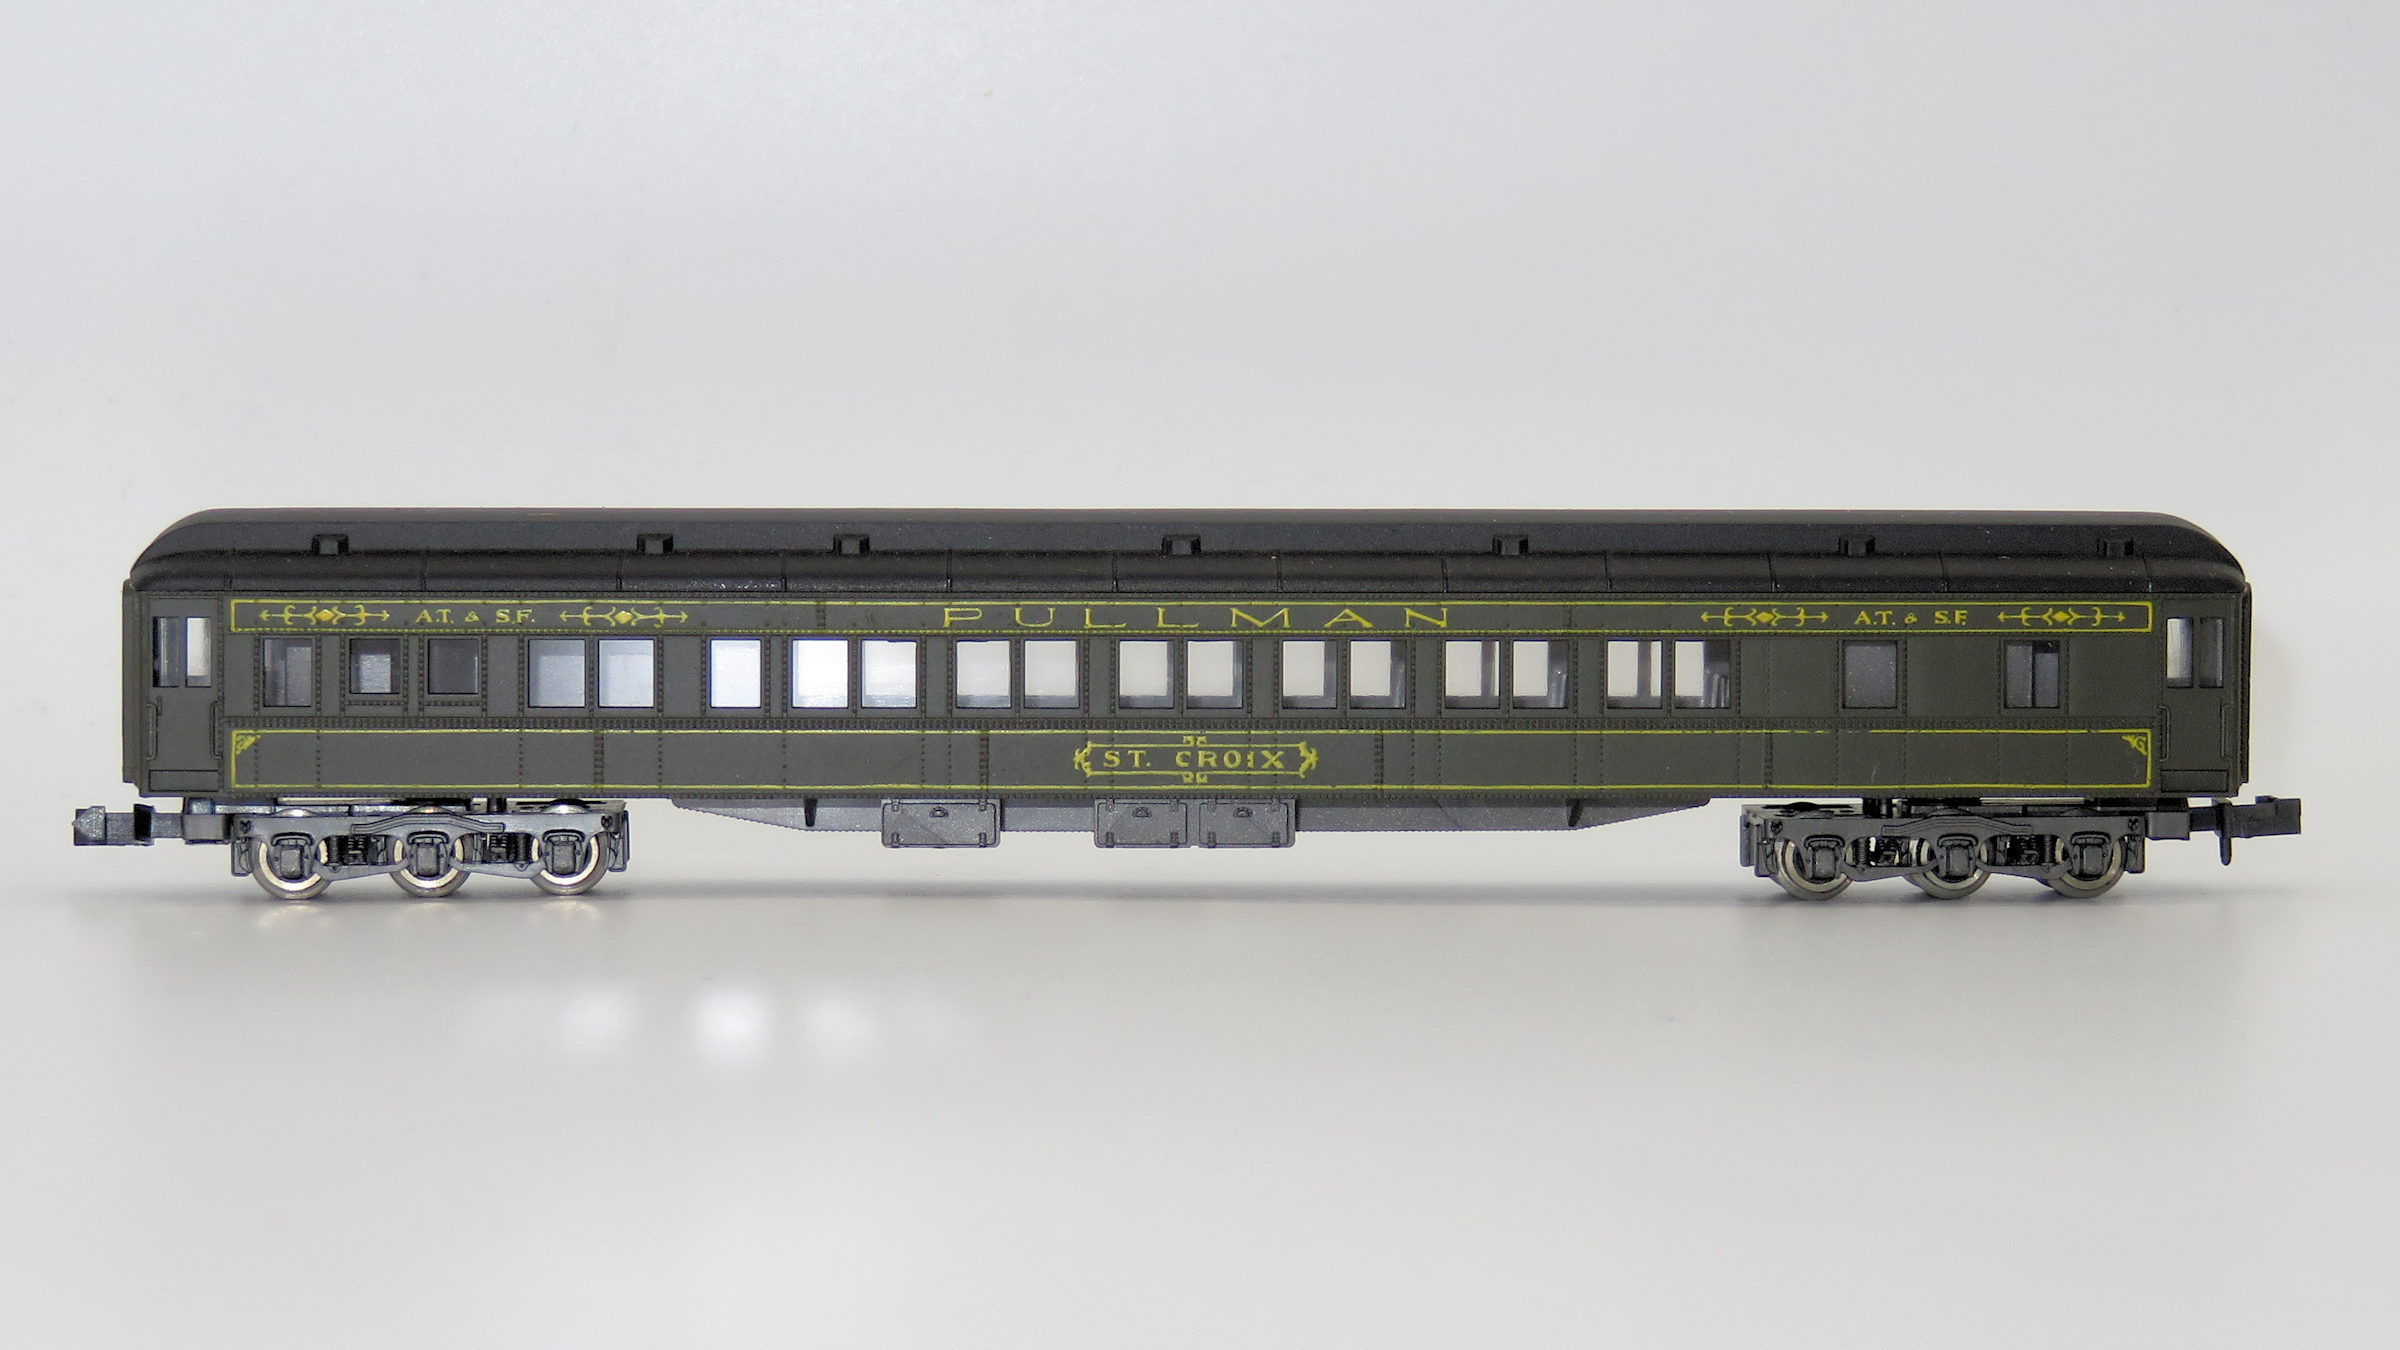 N Scale - Rivarossi - 9535 - Passenger Car, Heavyweight, Pullman Sleeper 10-1-2 - Santa Fe - St. Croix